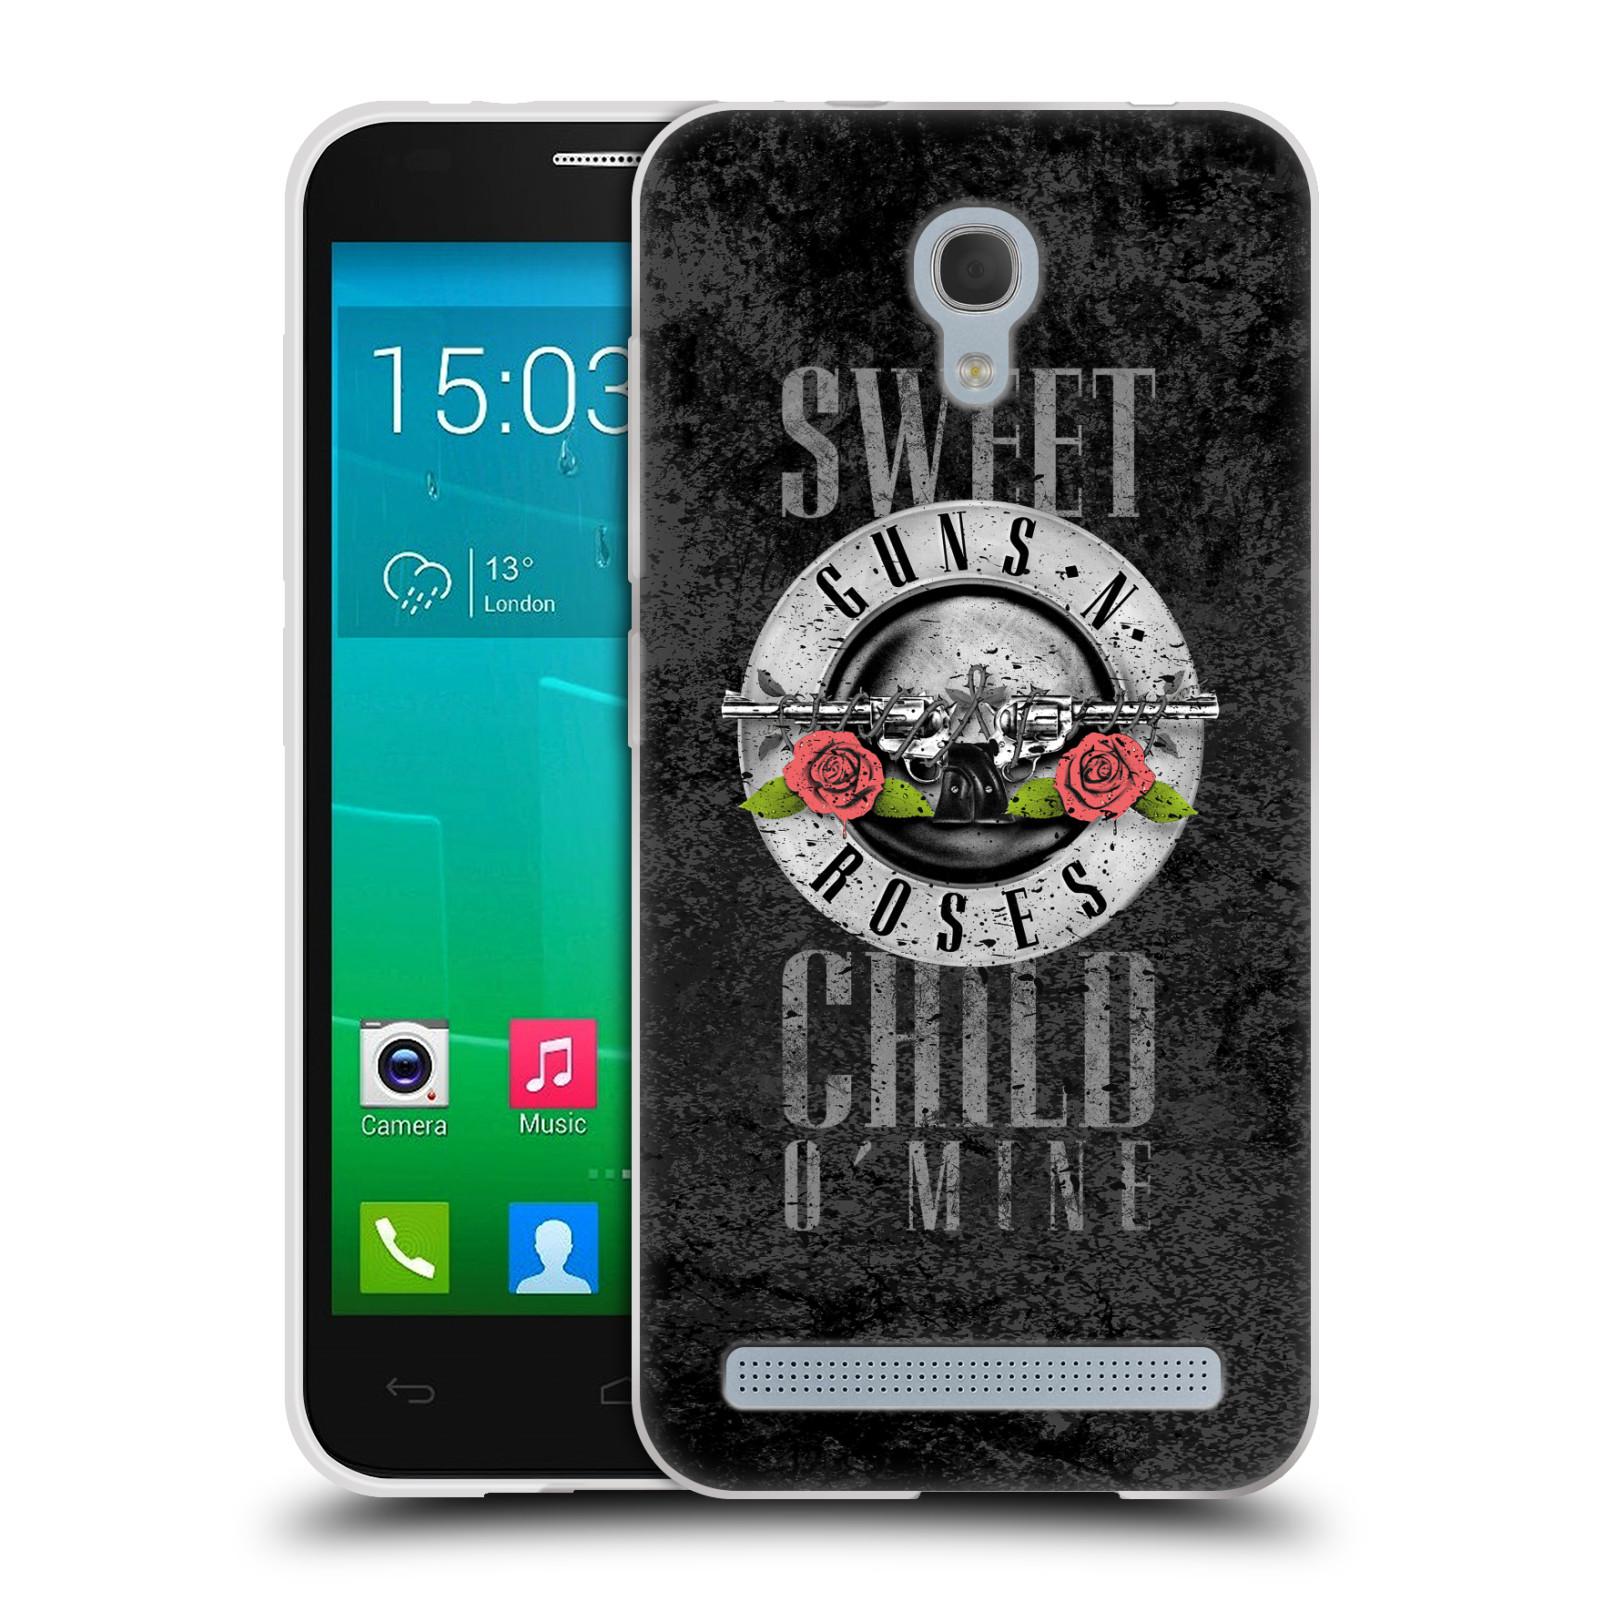 Silikonové pouzdro na mobil Alcatel One Touch Idol 2 Mini S 6036Y HEAD CASE Guns N' Roses - Sweet Child (Silikonový kryt či obal na mobilní telefon licencovaným motivem Guns N' Roses pro Alcatel Idol 2 Mini S OT-6036Y)